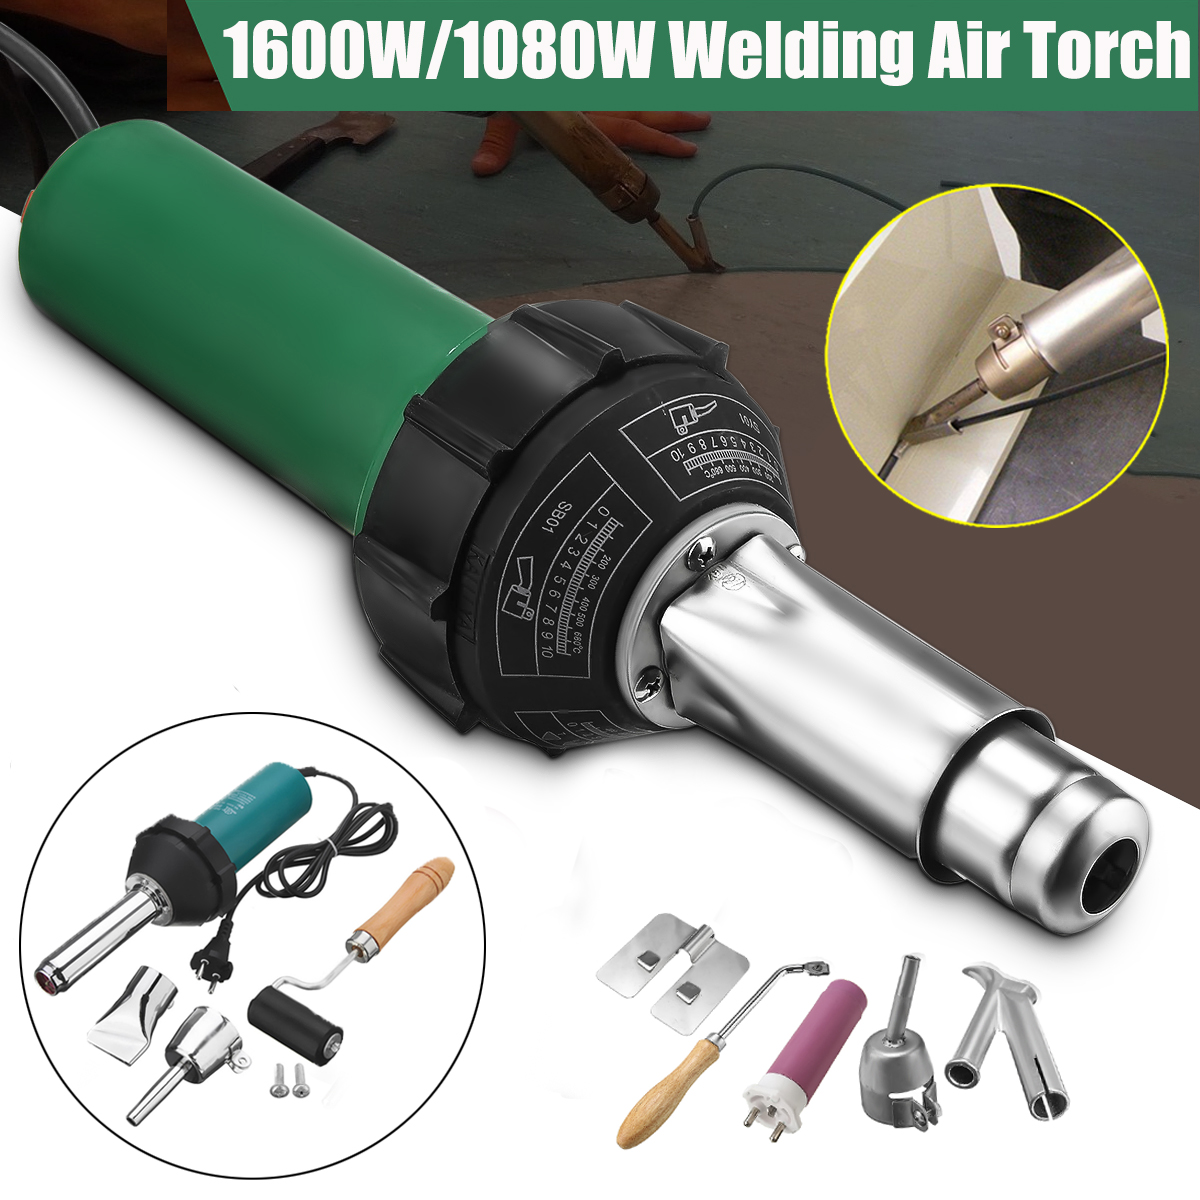 1600w 1080w Ac 220v Hot Air Plastic Welding Torch Welder